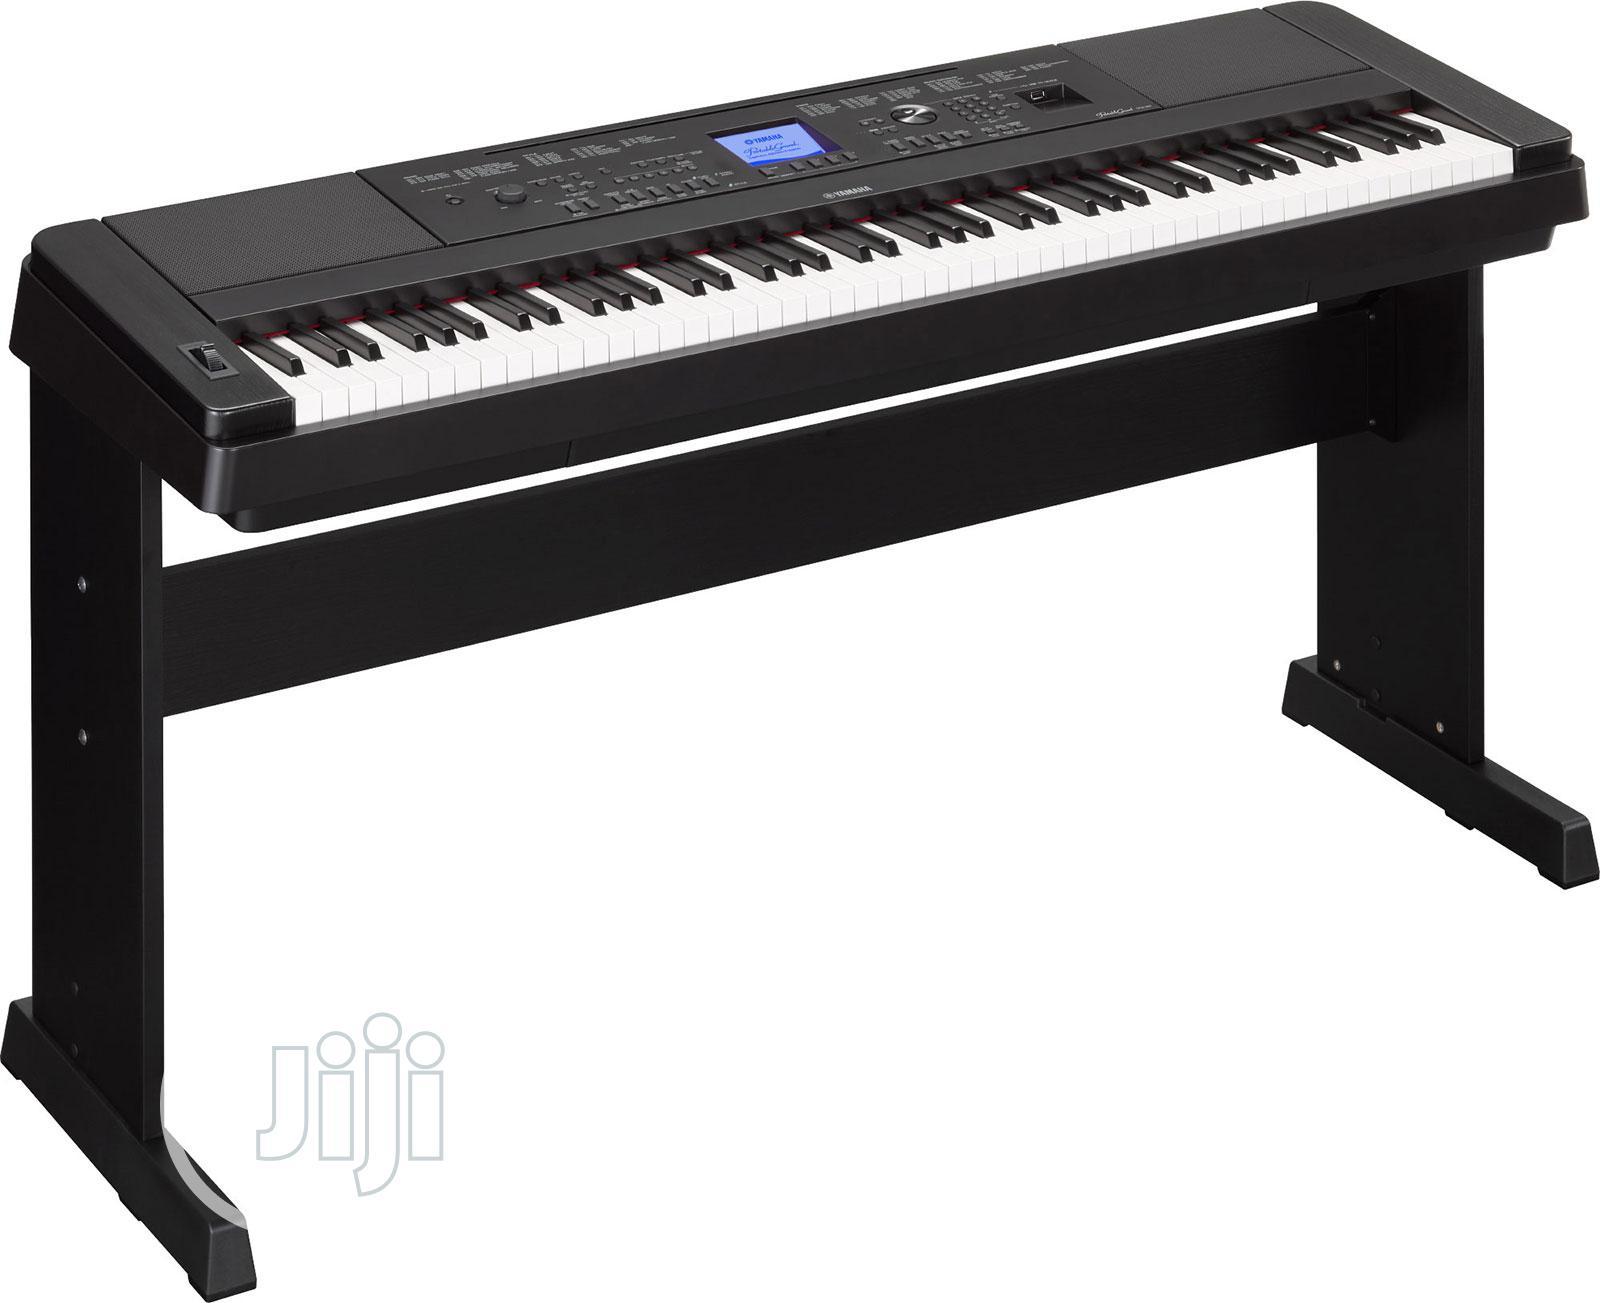 Archive: Yamaha DGX-660 Yamaha Piano -Ja07